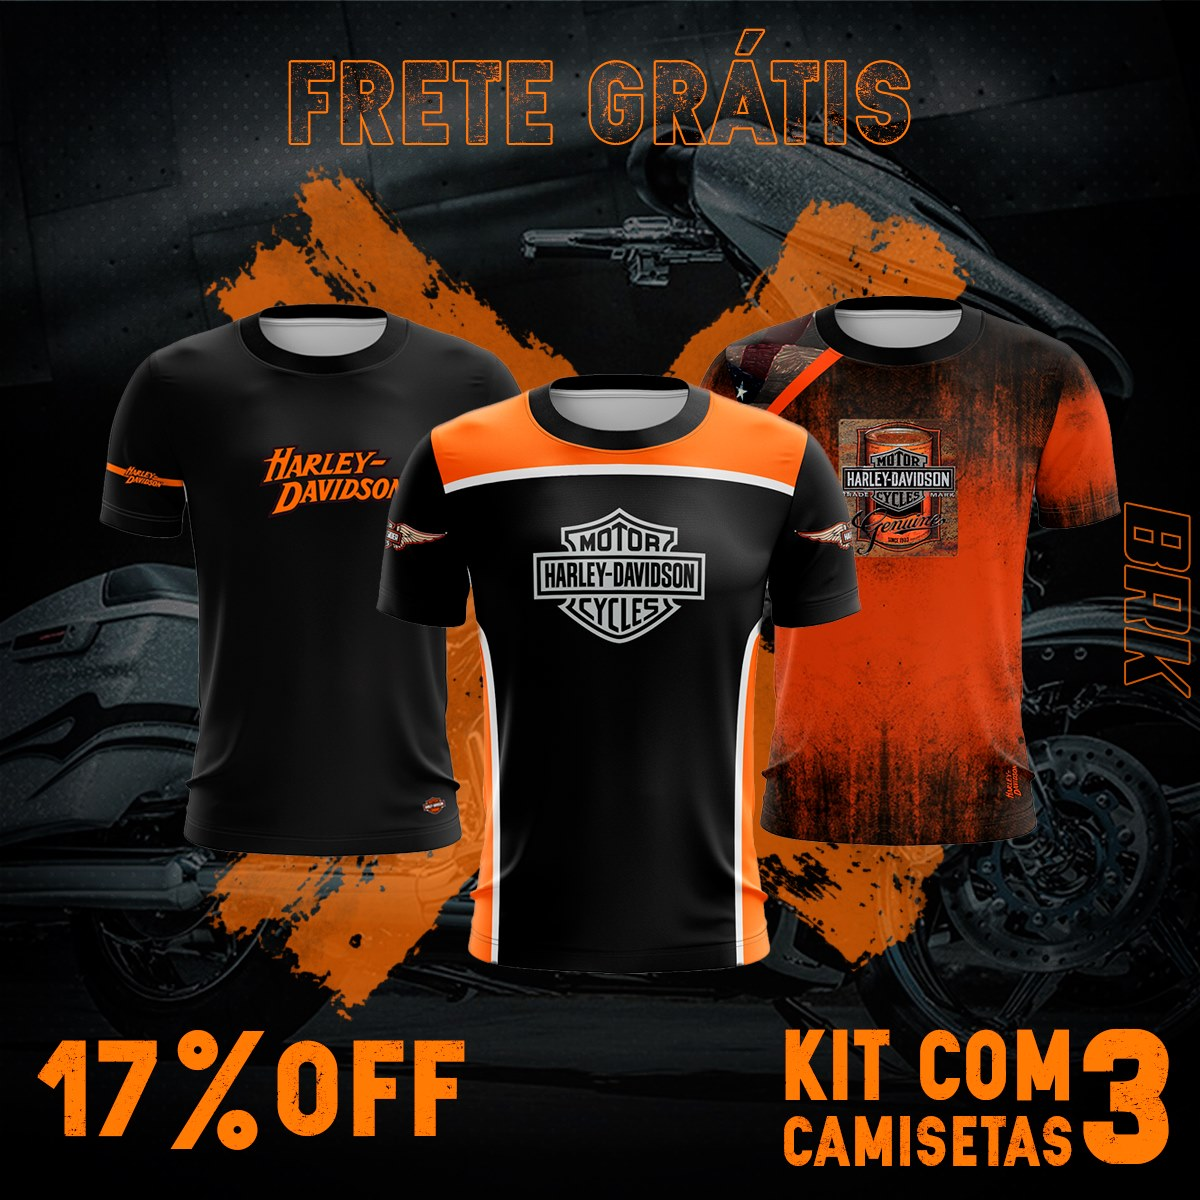 Kit 3 Camisetas Brk Motociclismo Harley Davidson com FPU 50+